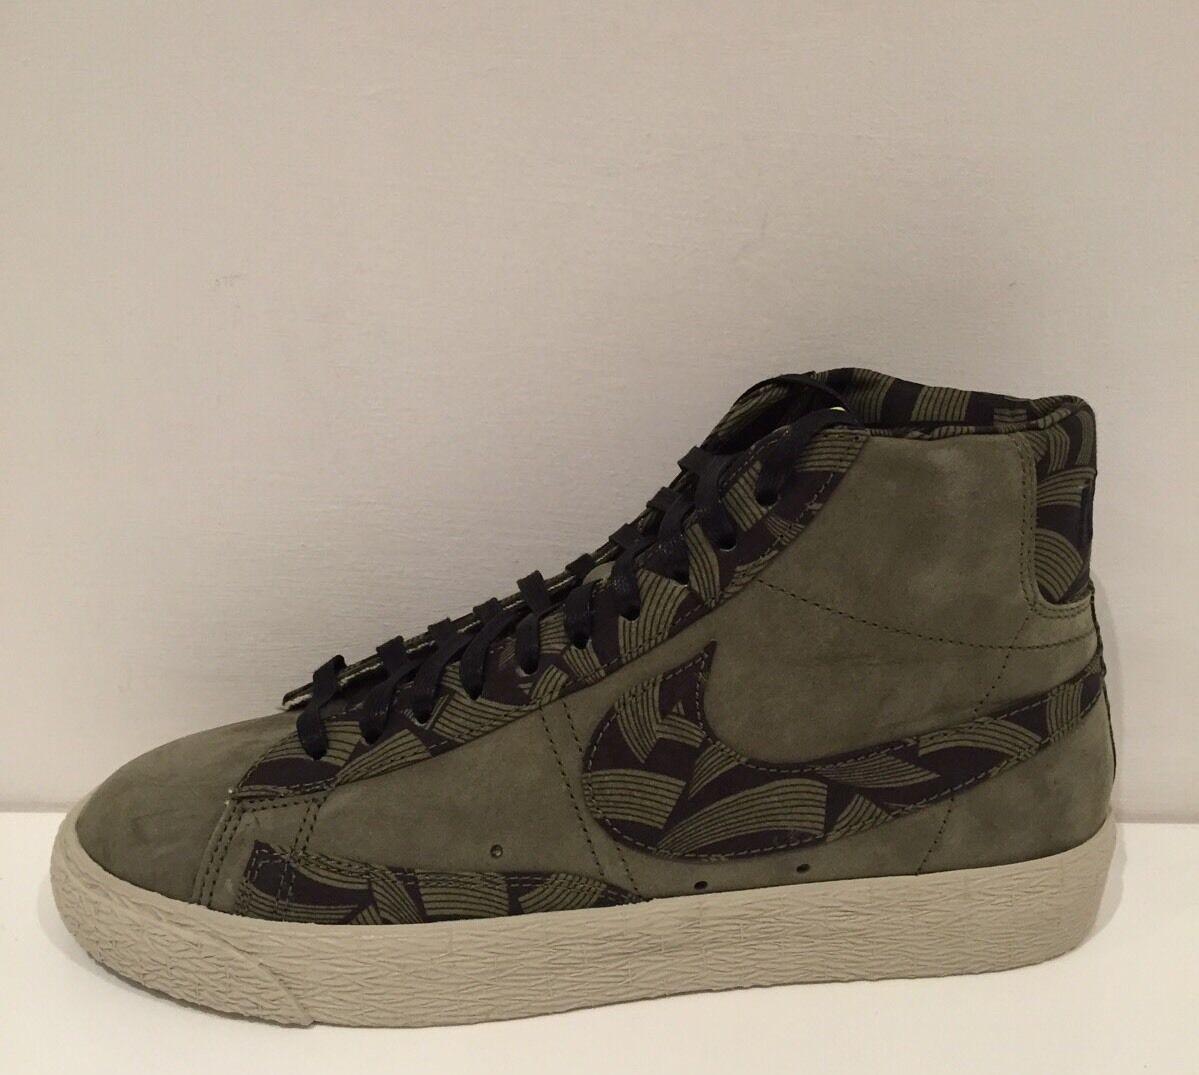 Nike Blazer Mid Mid Blazer Vintage Liberty og Qs (Reino Unido) Nuevo Y En Caja dd8a69